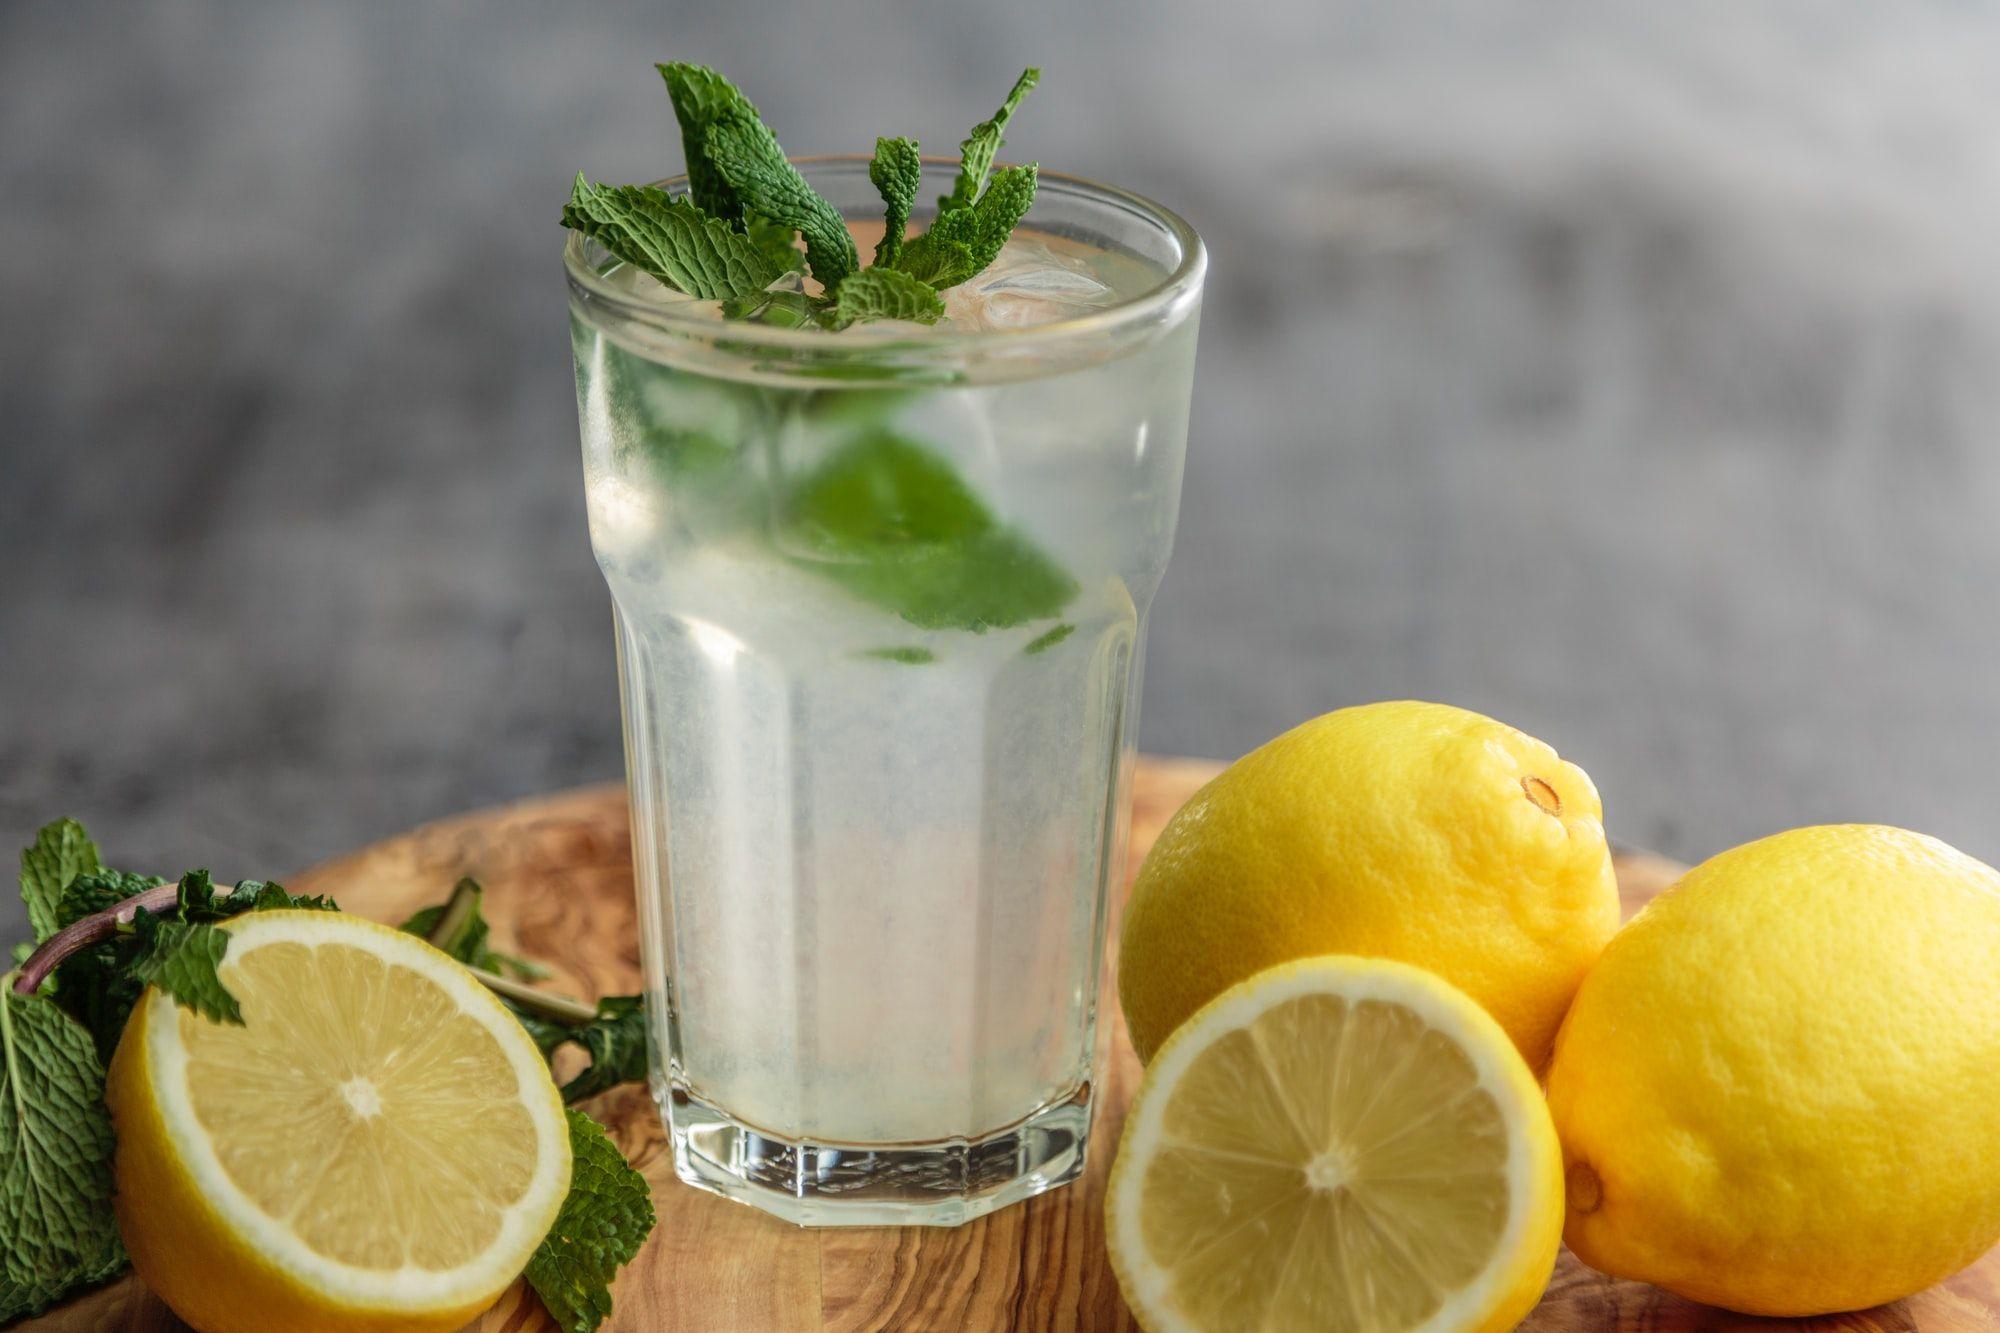 How to make yummy nimbu pani or lemonade or shikanji?